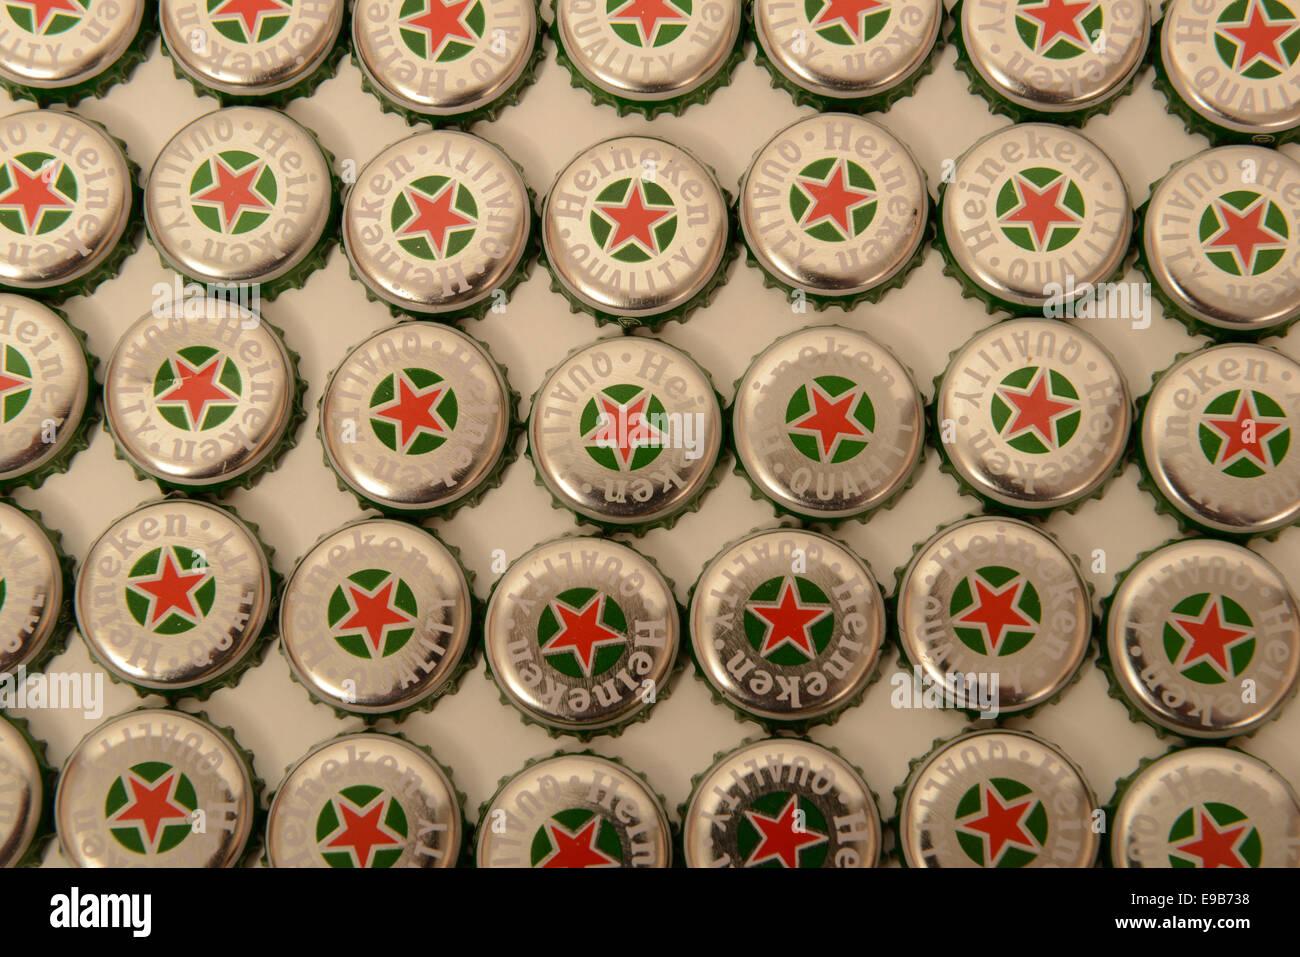 Rows of Heineken bottle caps against a white background - Stock Image